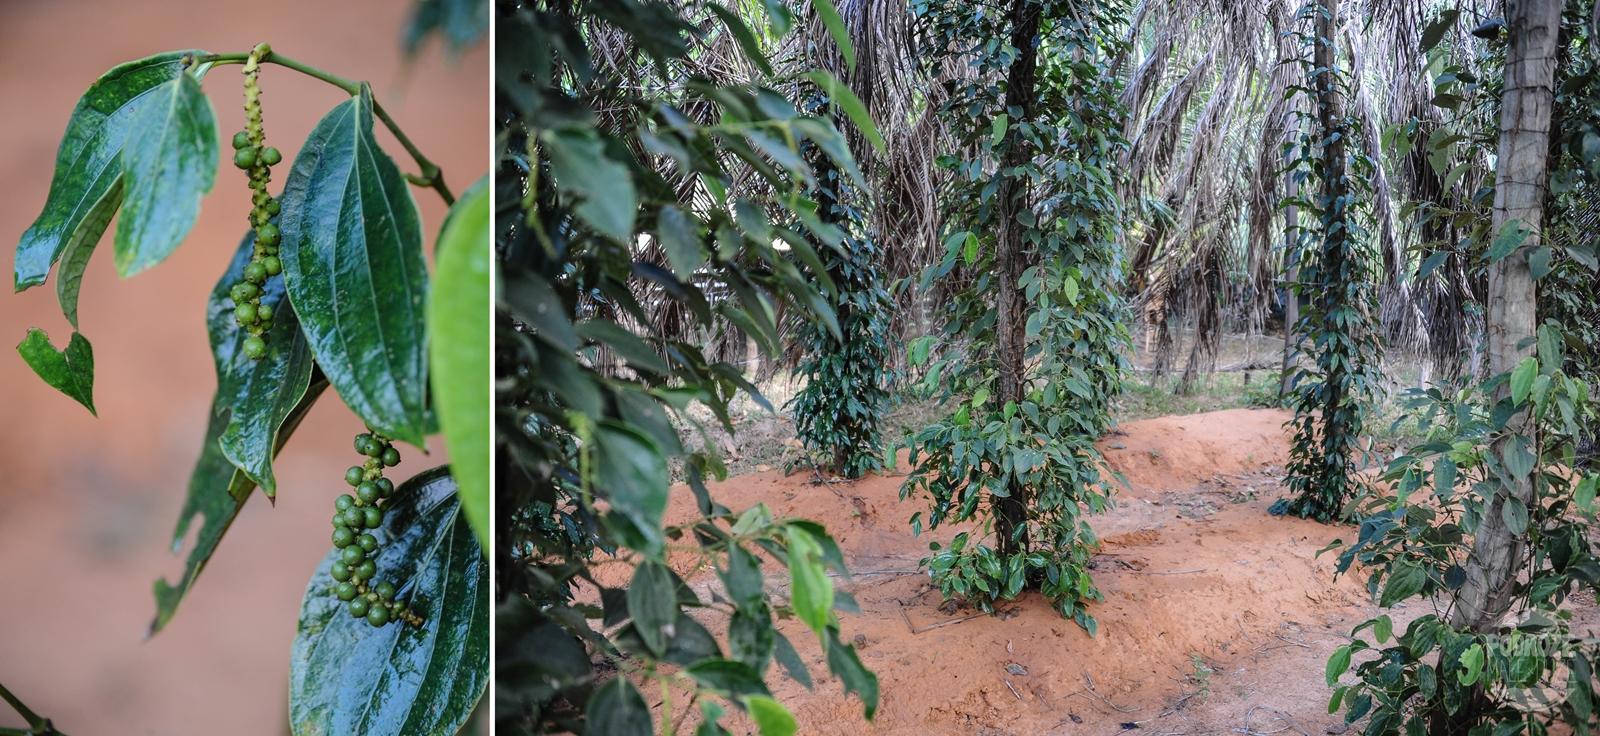 plantacja pieprzu kampot kambodza